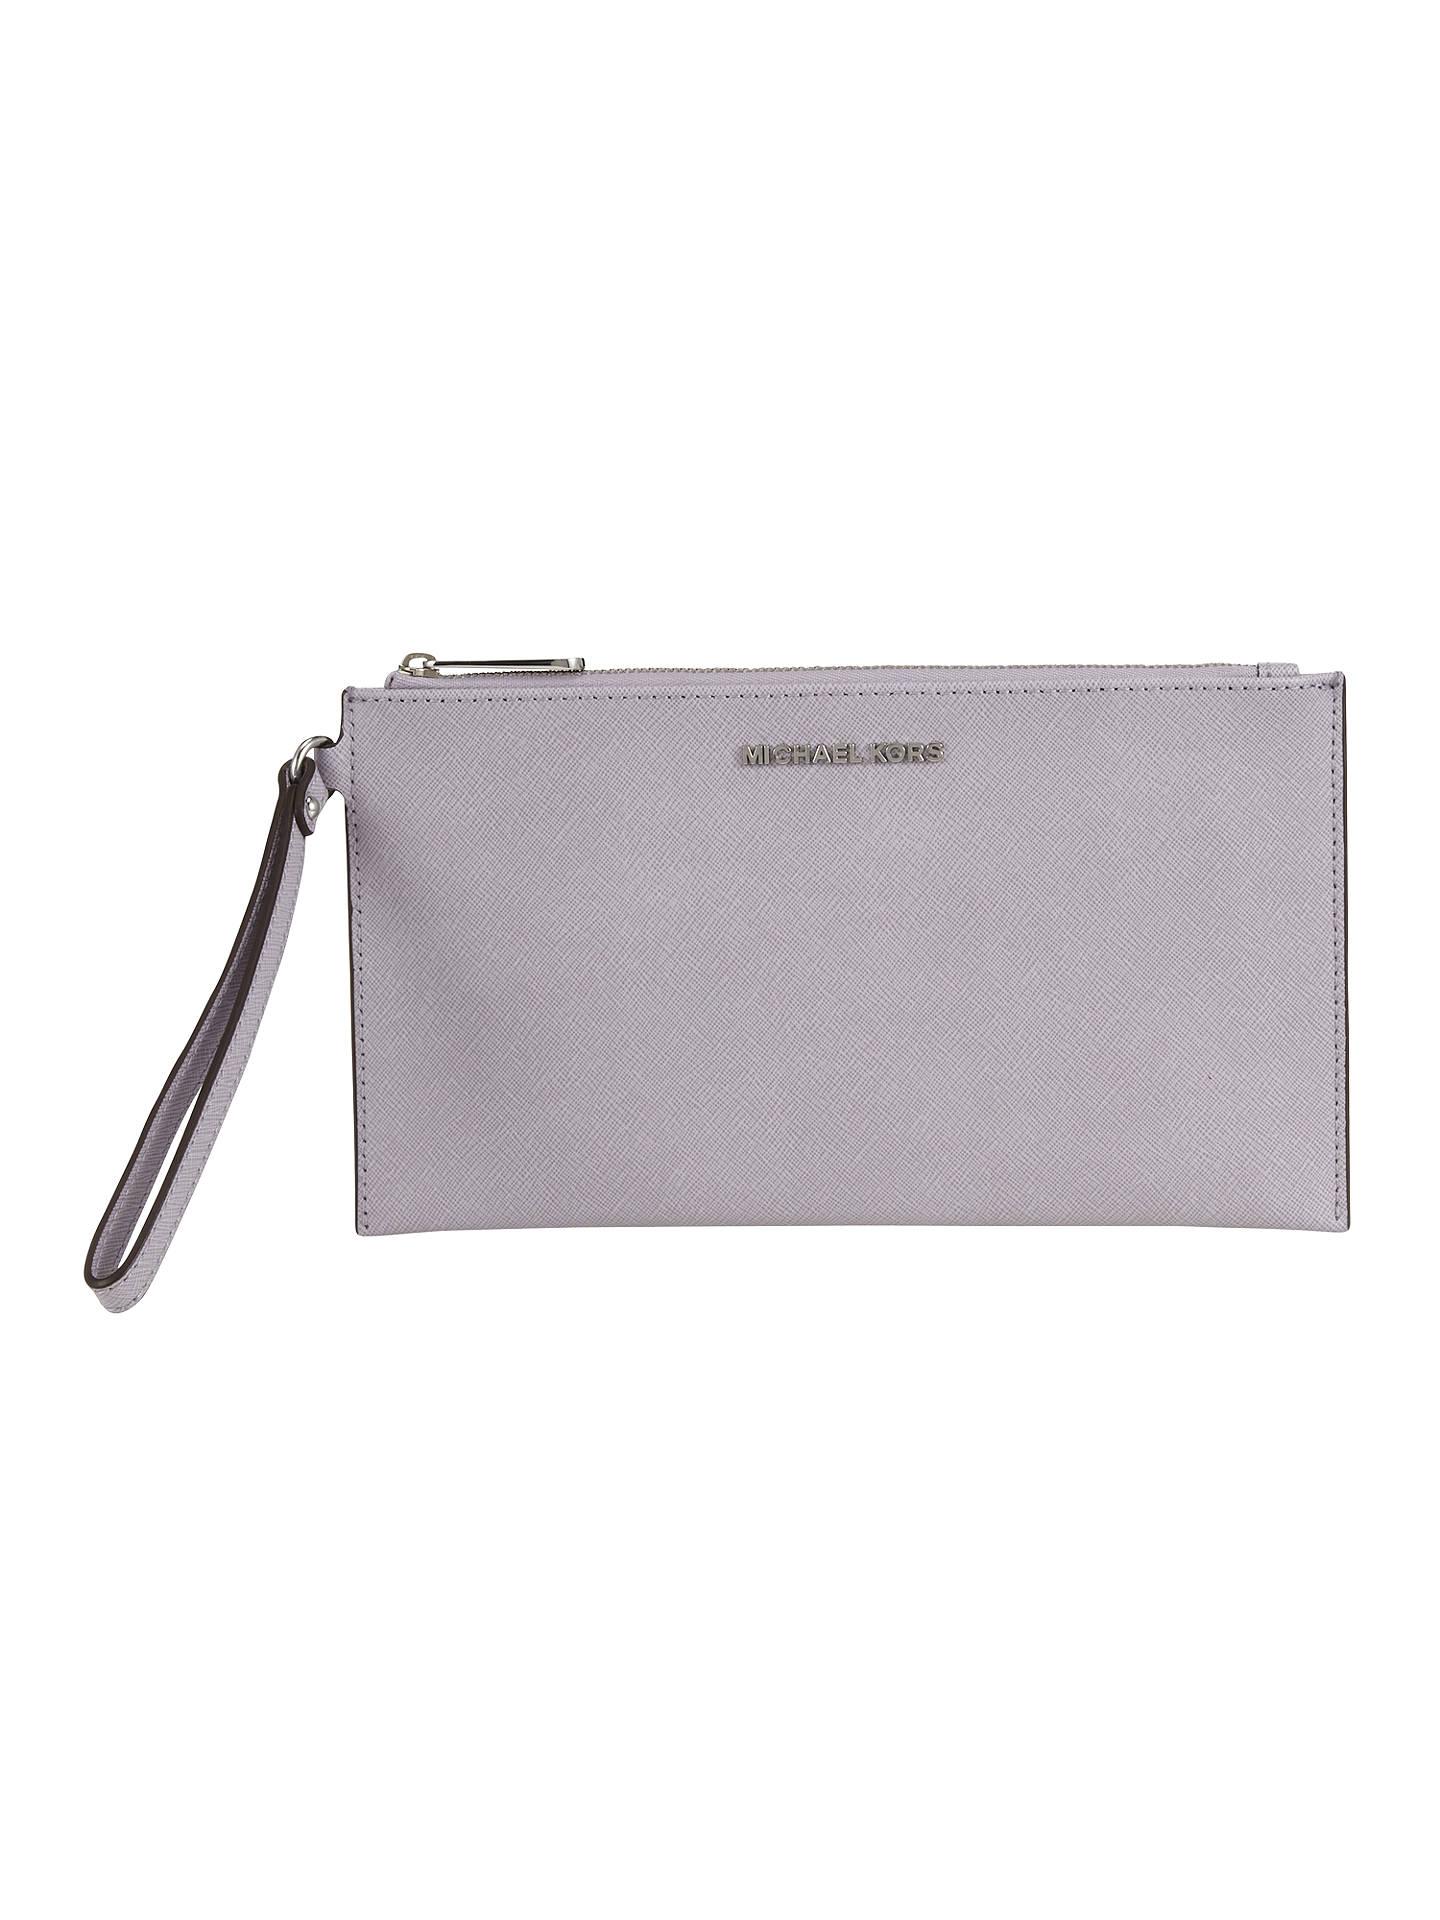 e7e39d0197b2 Buy MICHAEL Michael Kors Jet Set Travel Leather Zip Clutch Bag, Lilac  Online at johnlewis ...